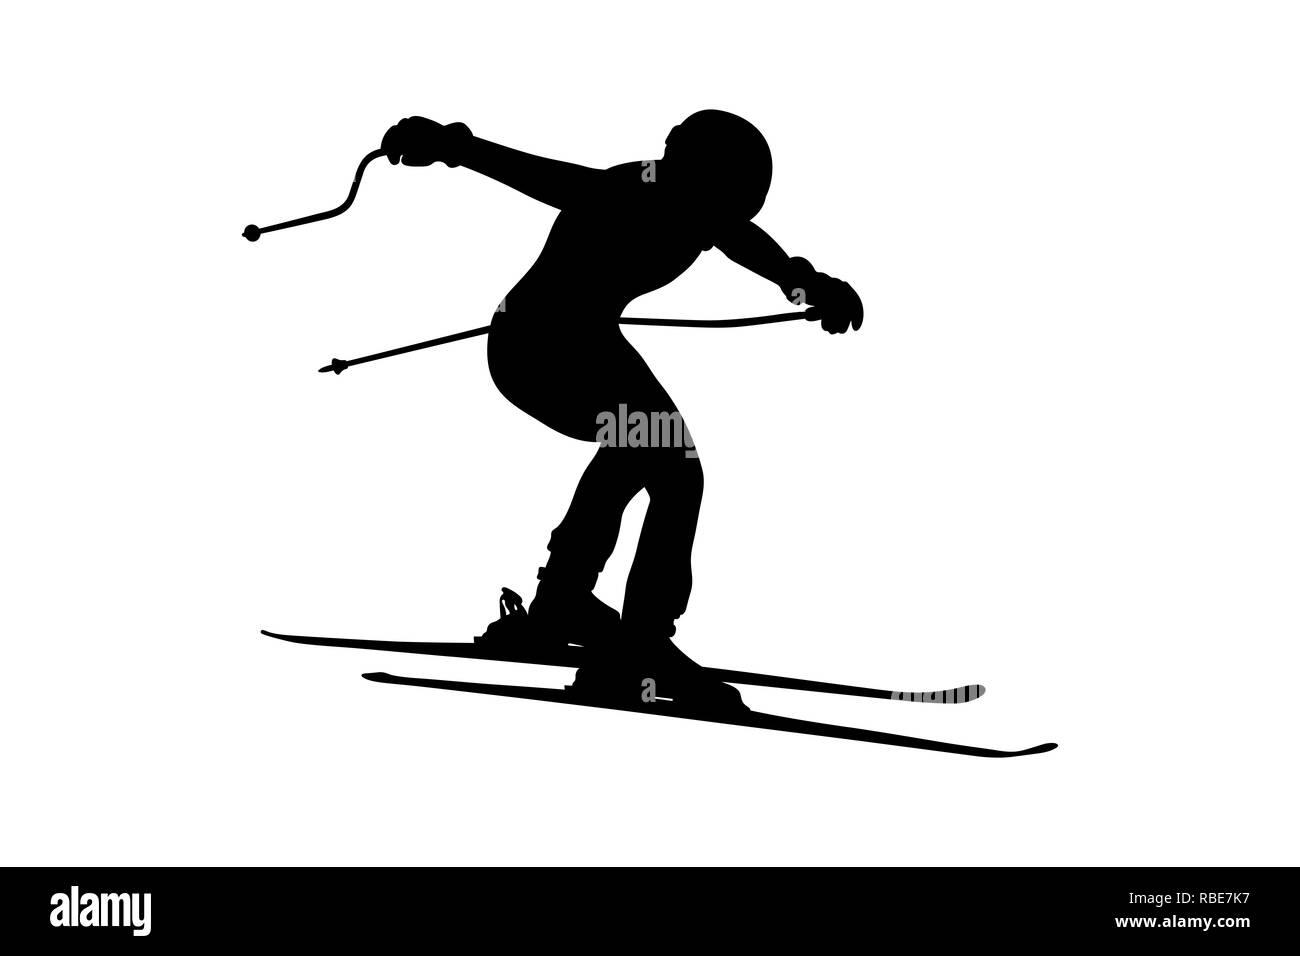 alpine skiing men jump downhill black silhouette - Stock Image